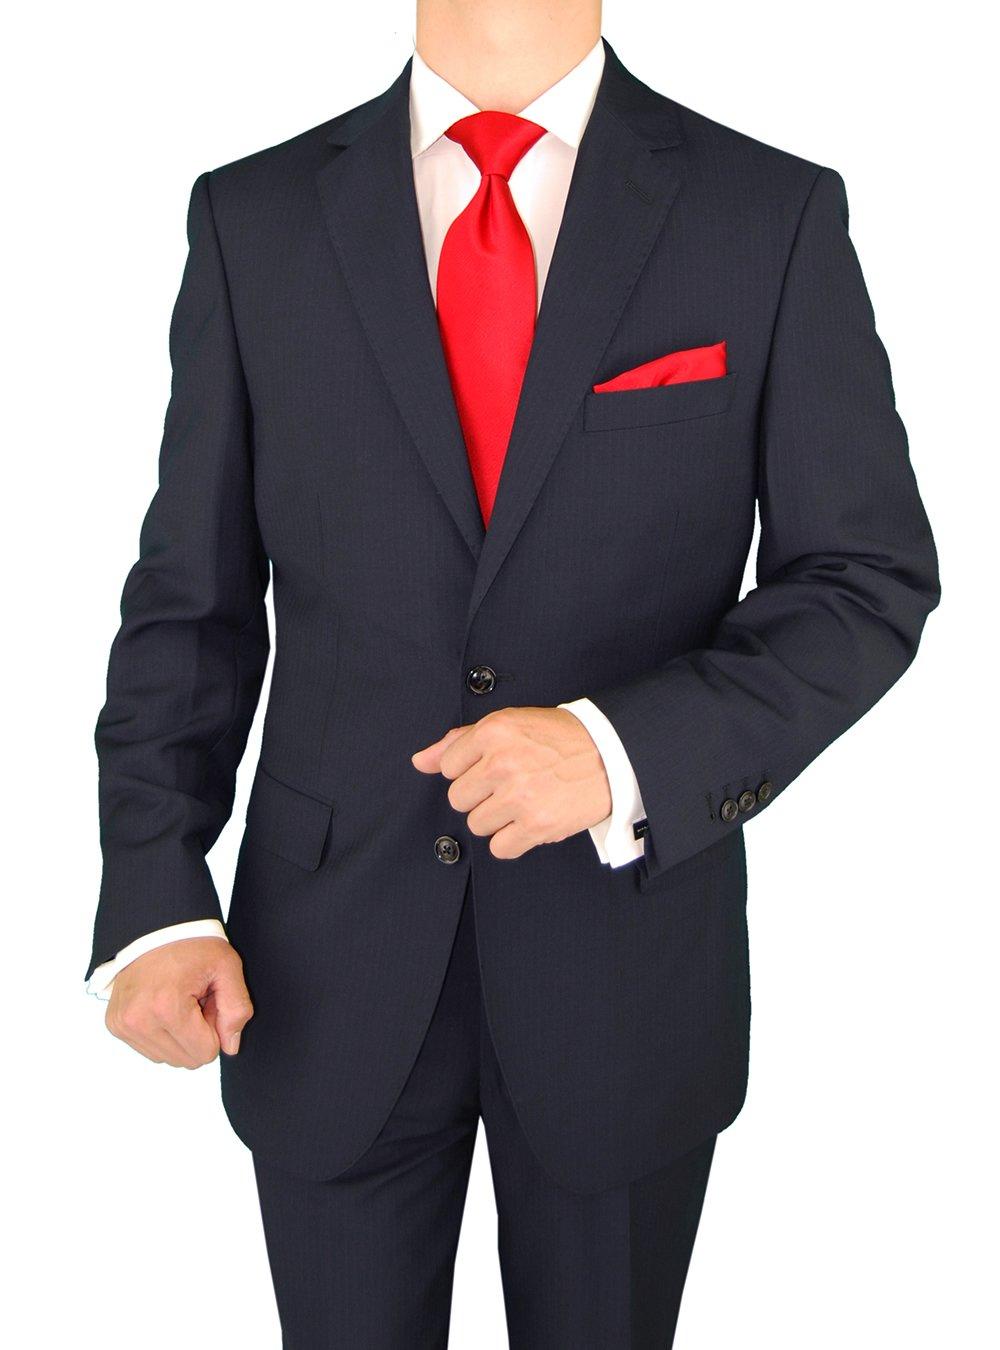 Gino Valentino Men's Two Button Modern Striped Night Navy Suit (38 Regular US / 48 Regular EU)